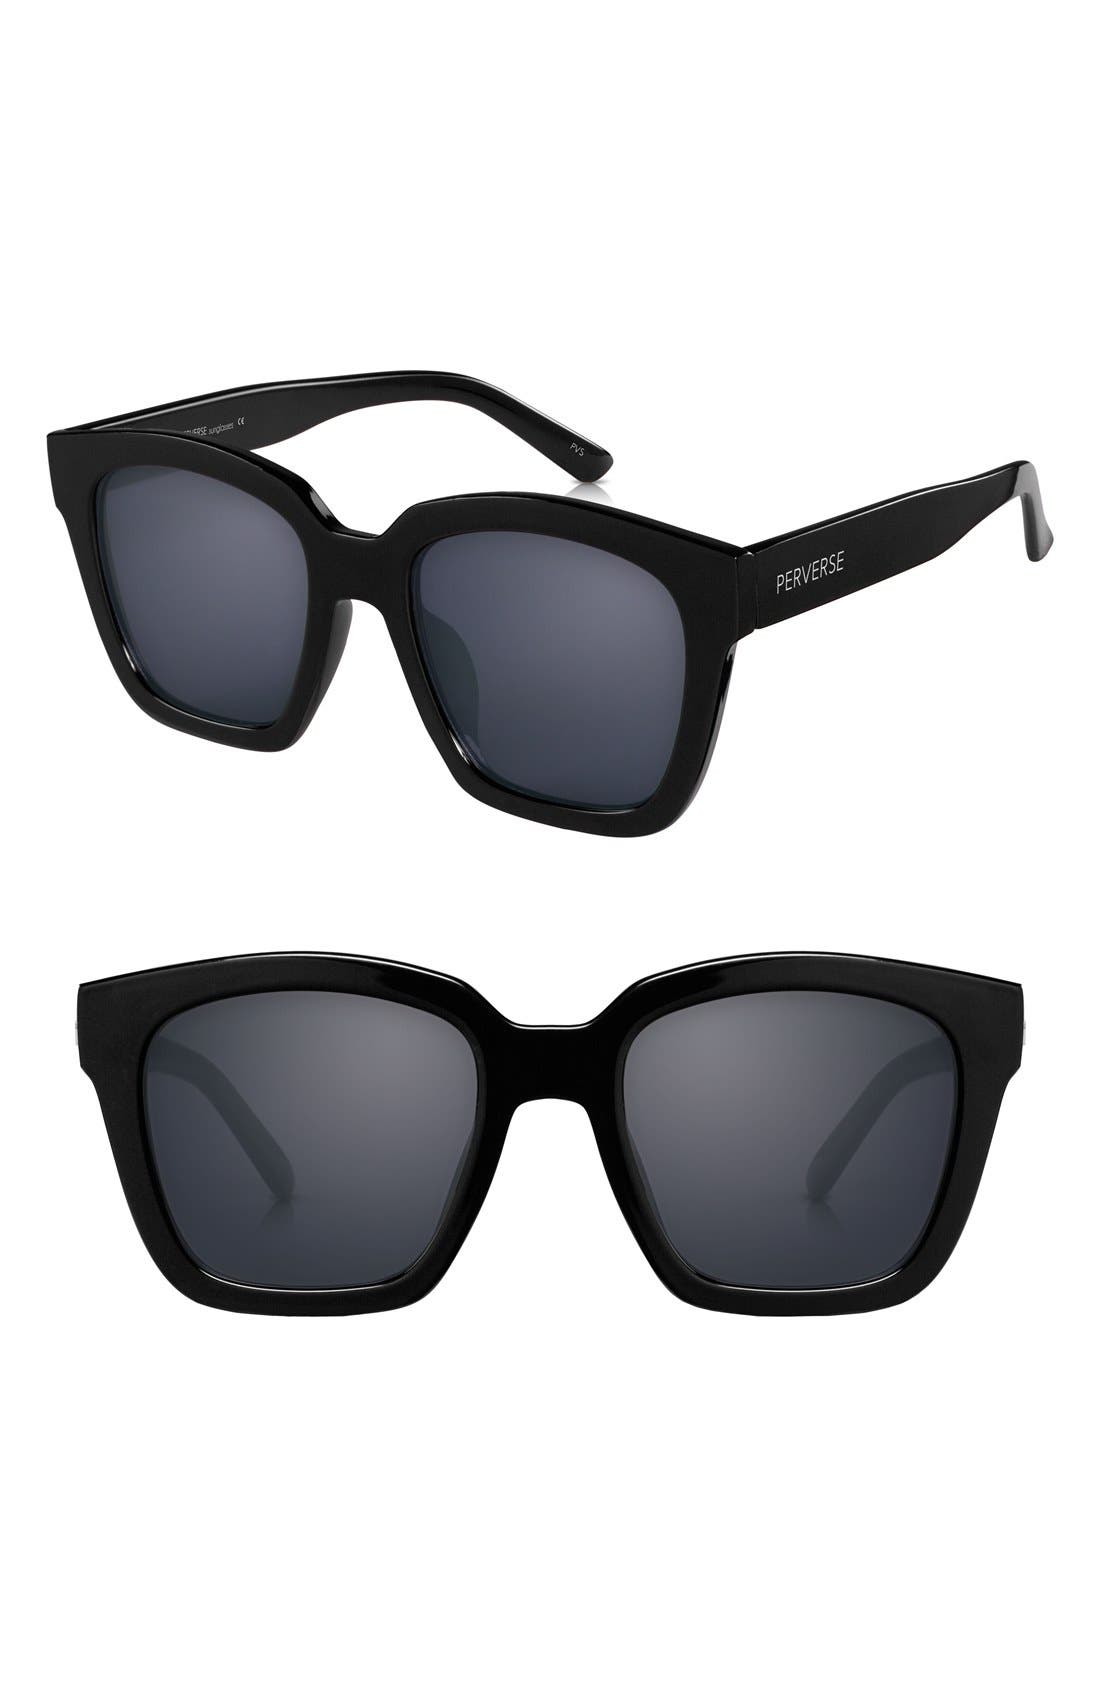 Main Image - PERVERSE Ace 58mm Sunglasses